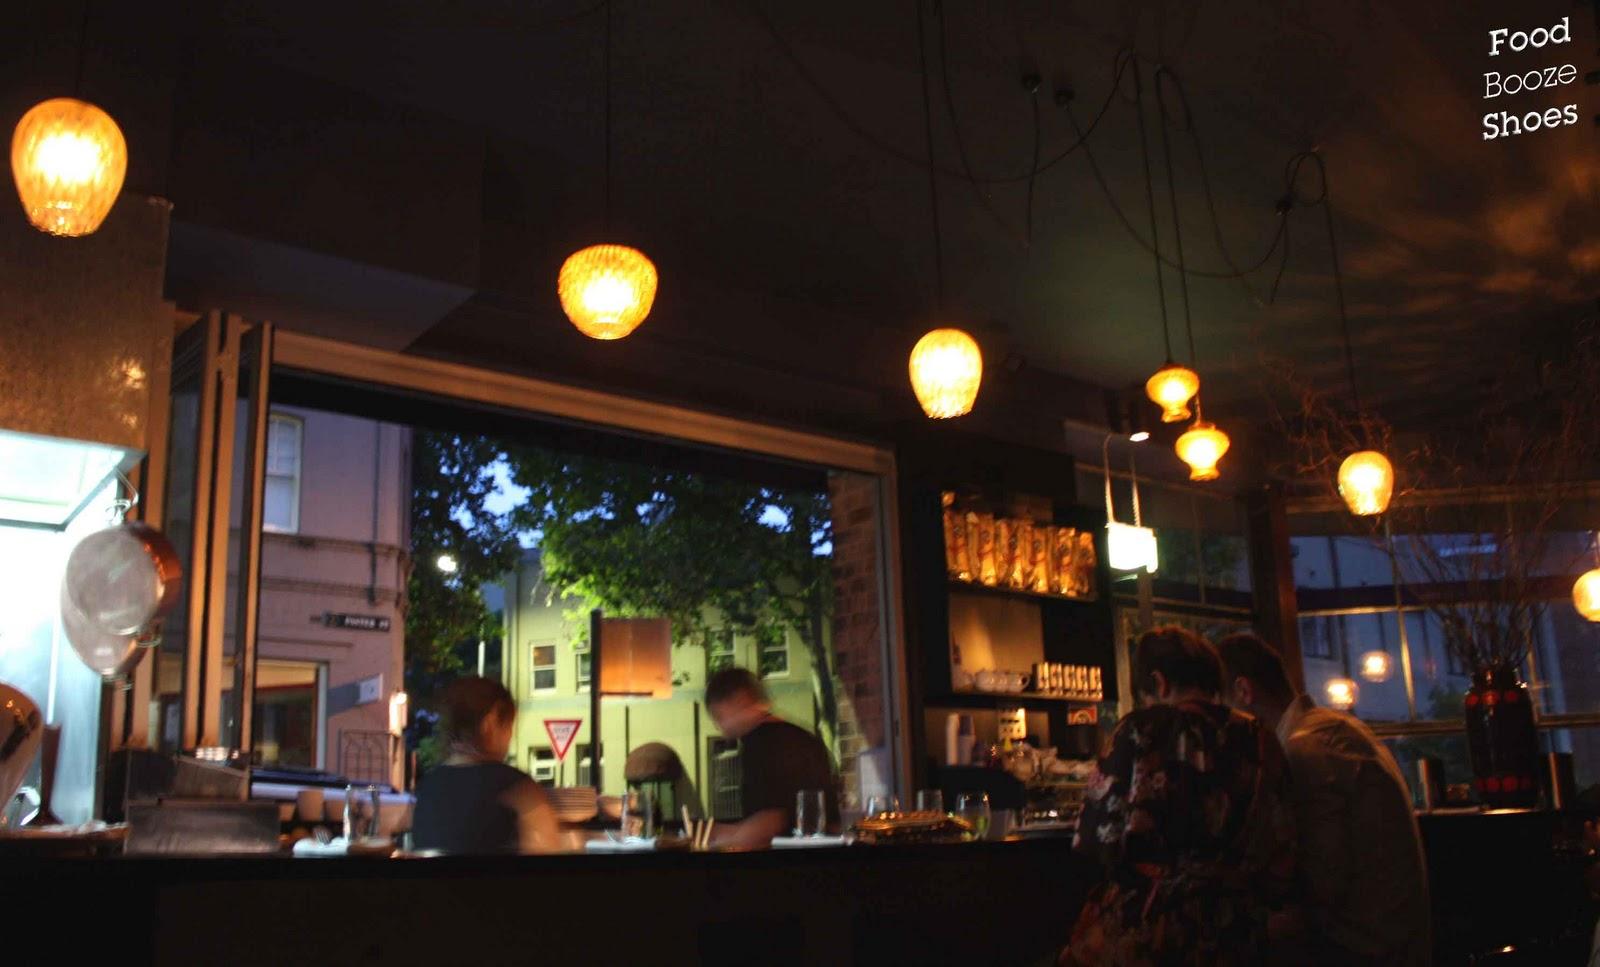 Hamish S Kitchen Restaurant Scarborough On Ml V